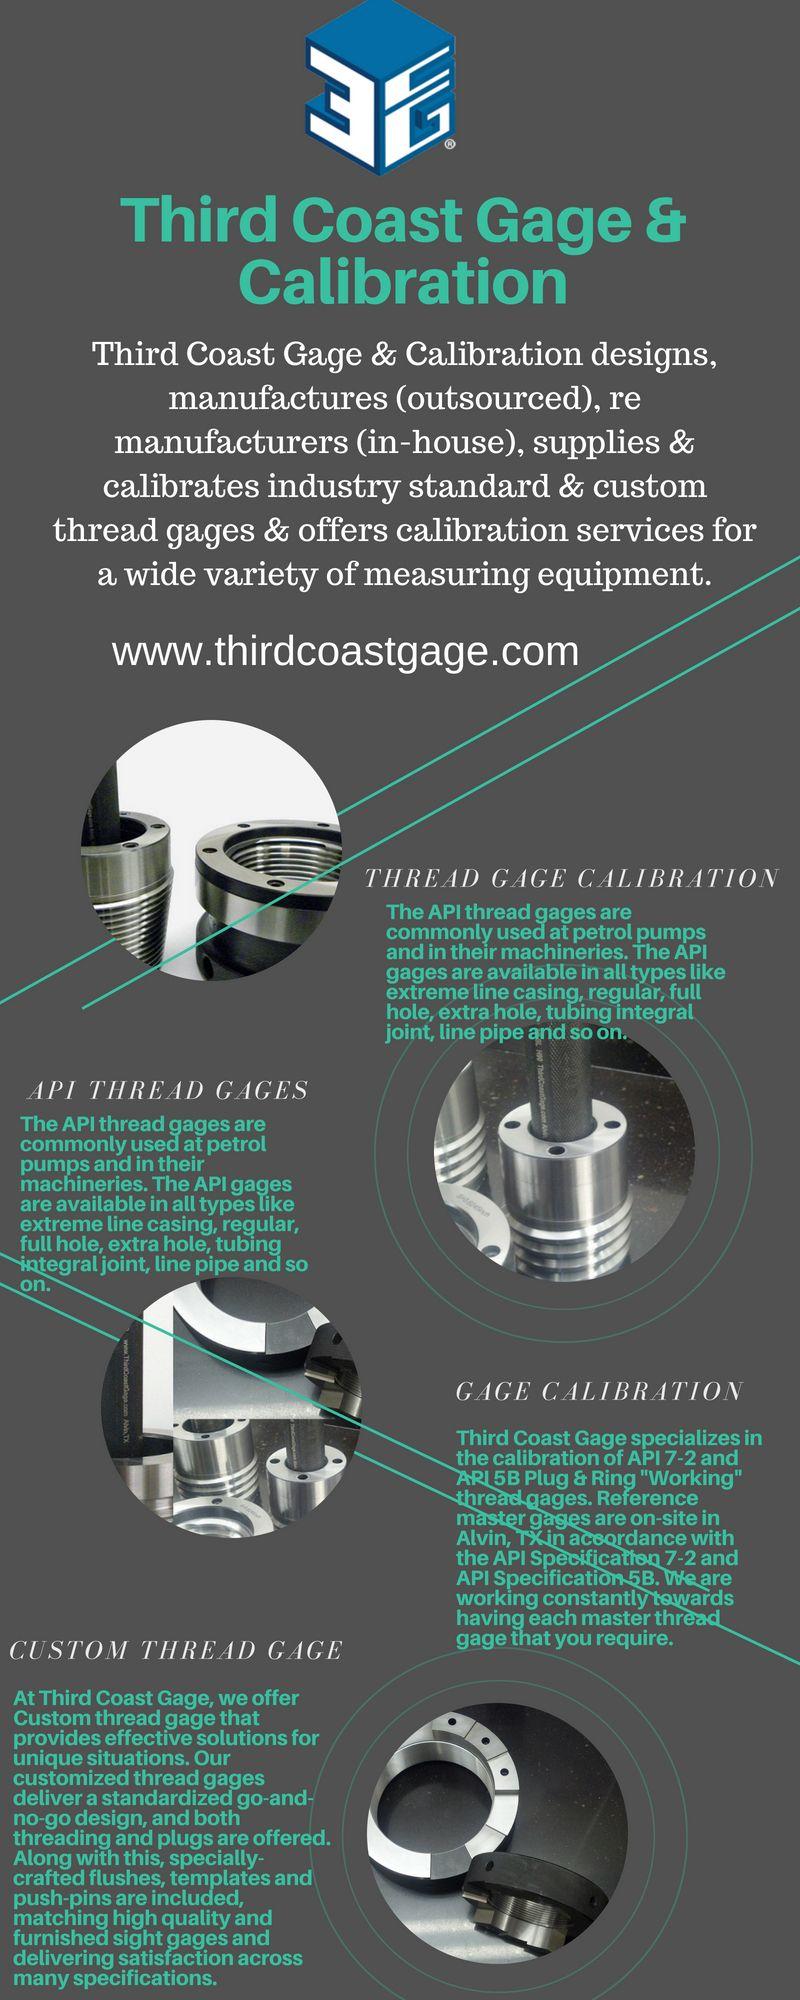 Third Coast Gage & Calibration specializes in Spec 7-2 & 5B